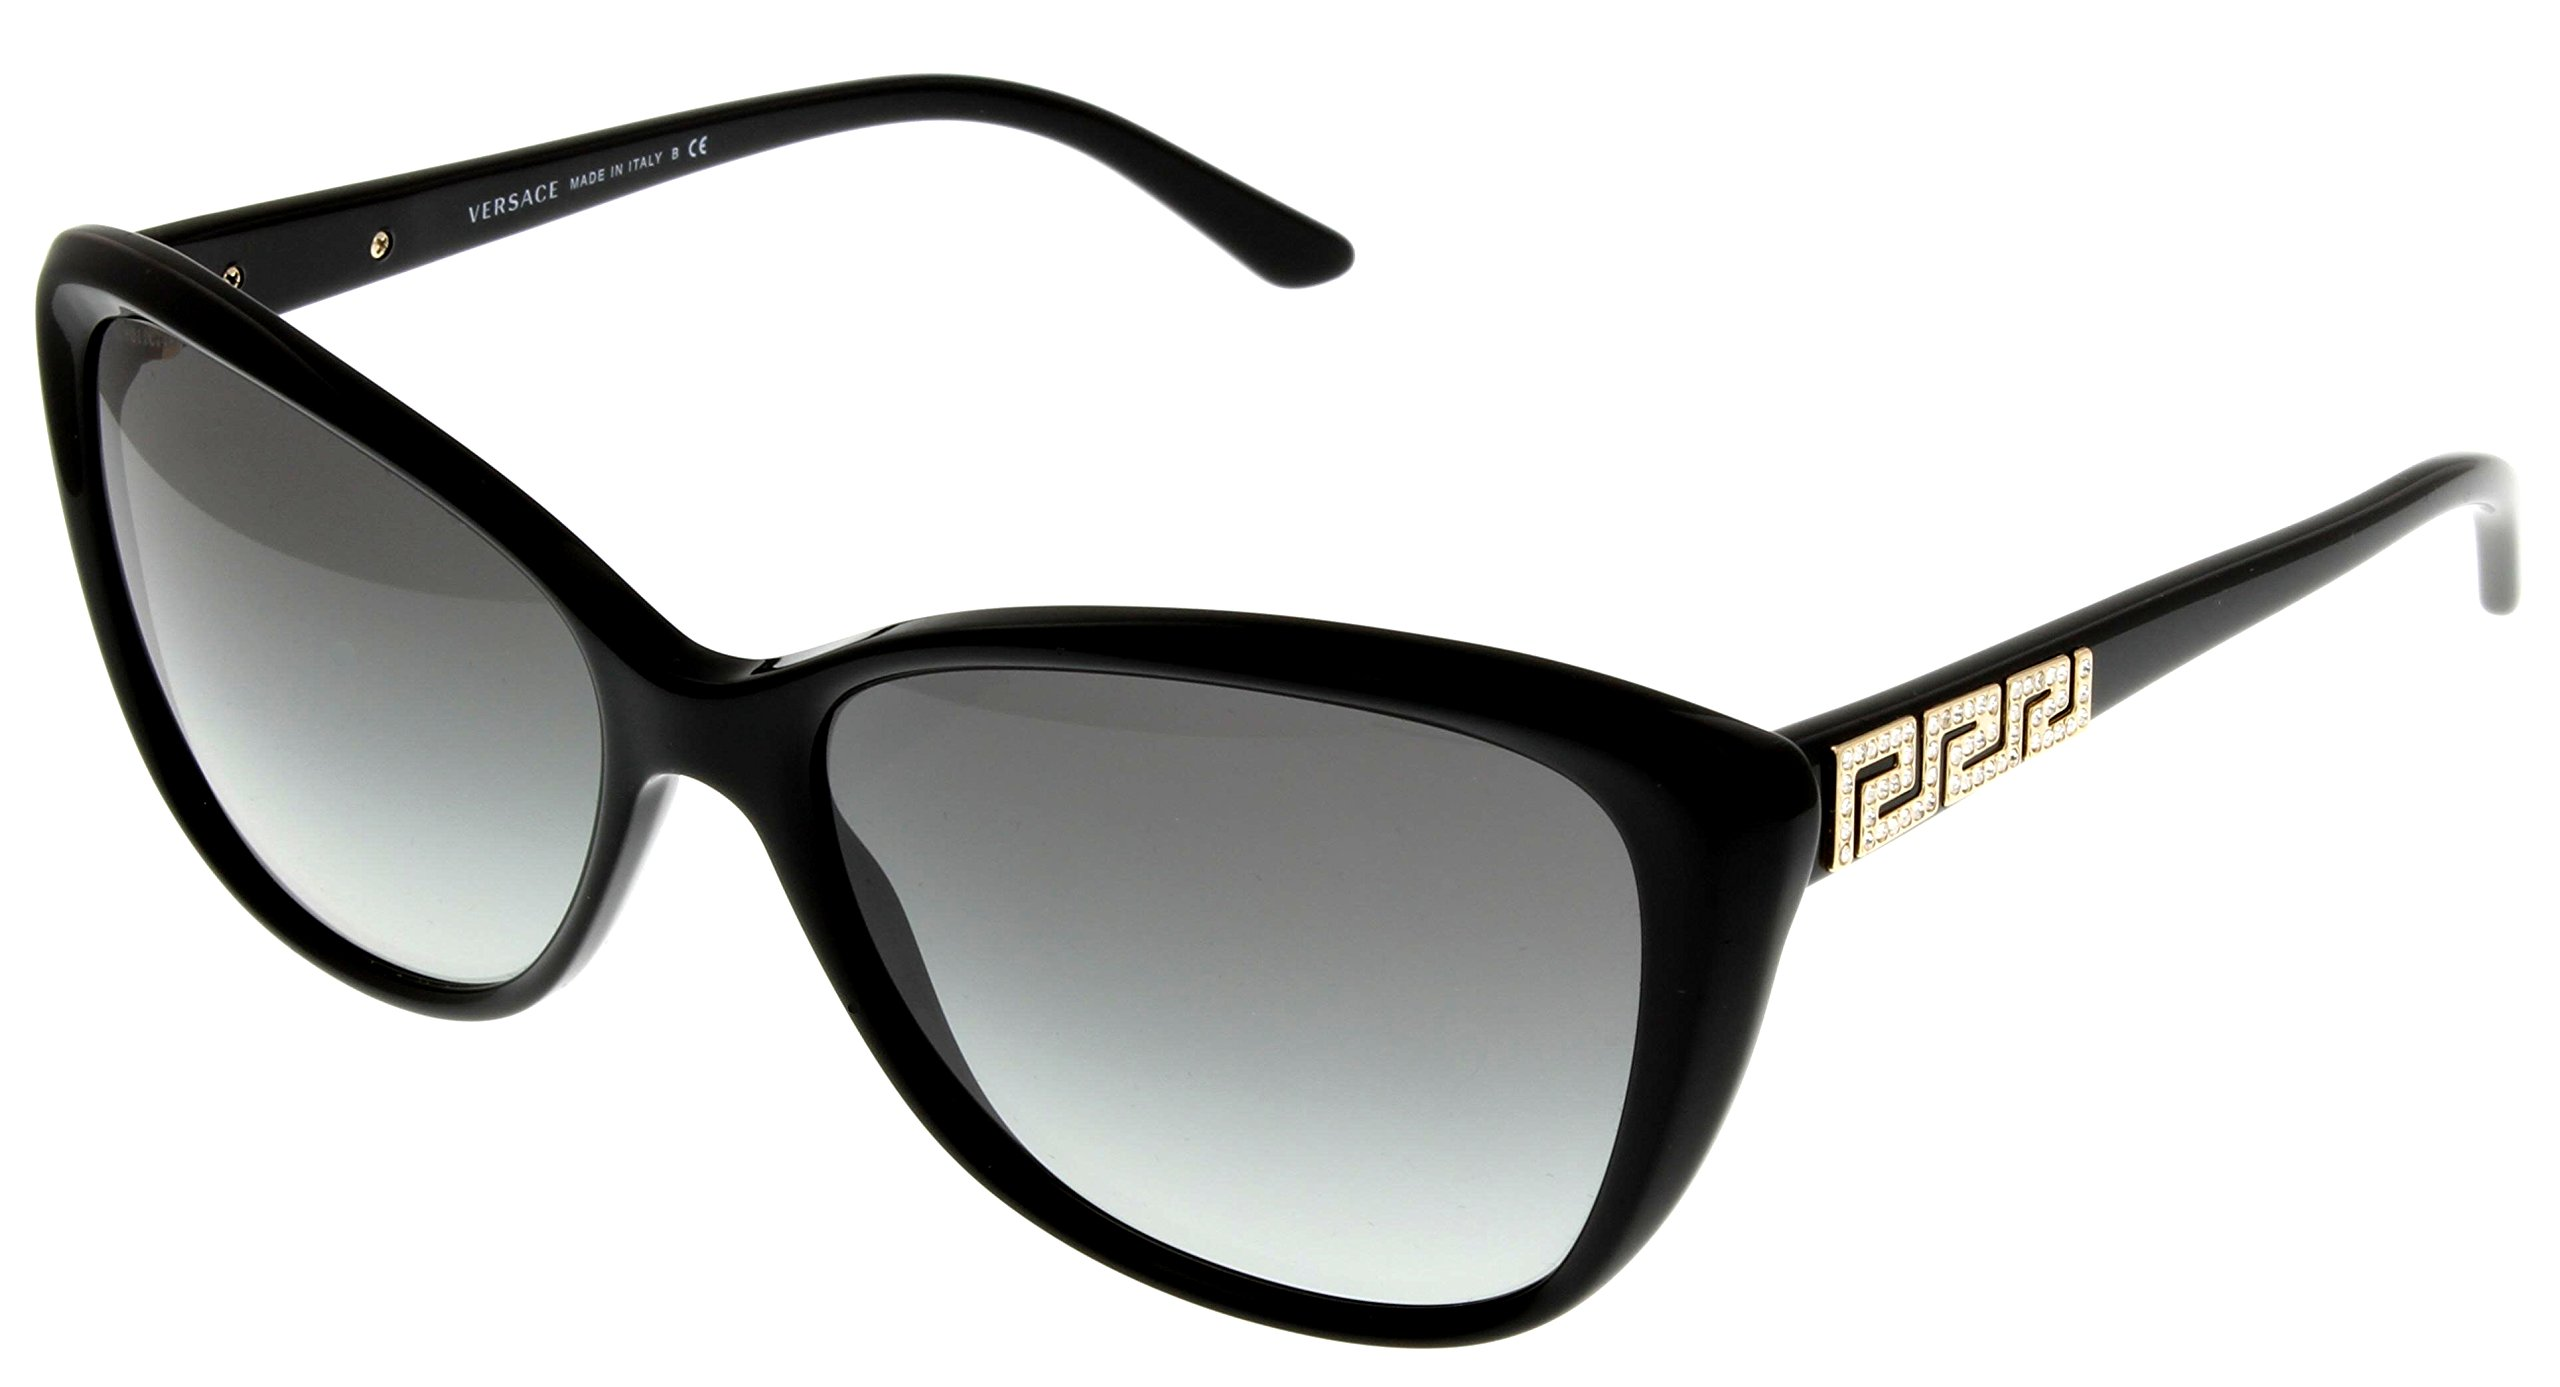 Versace Sunglasses Women Black Butterfly VE4264B GB1/11